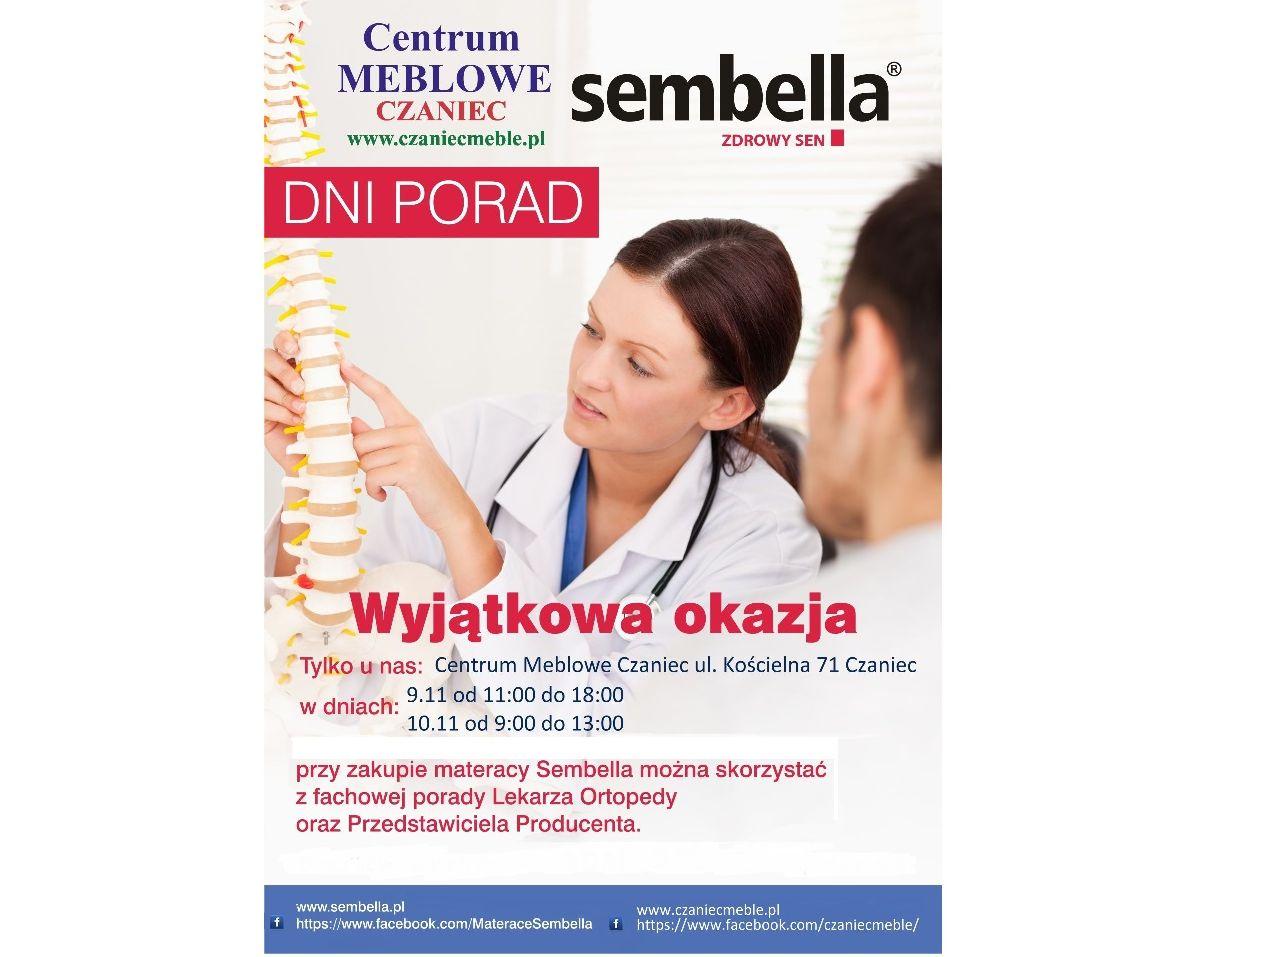 Kup materac podczas Dni Porad Sembella z lekarzem ortopedą